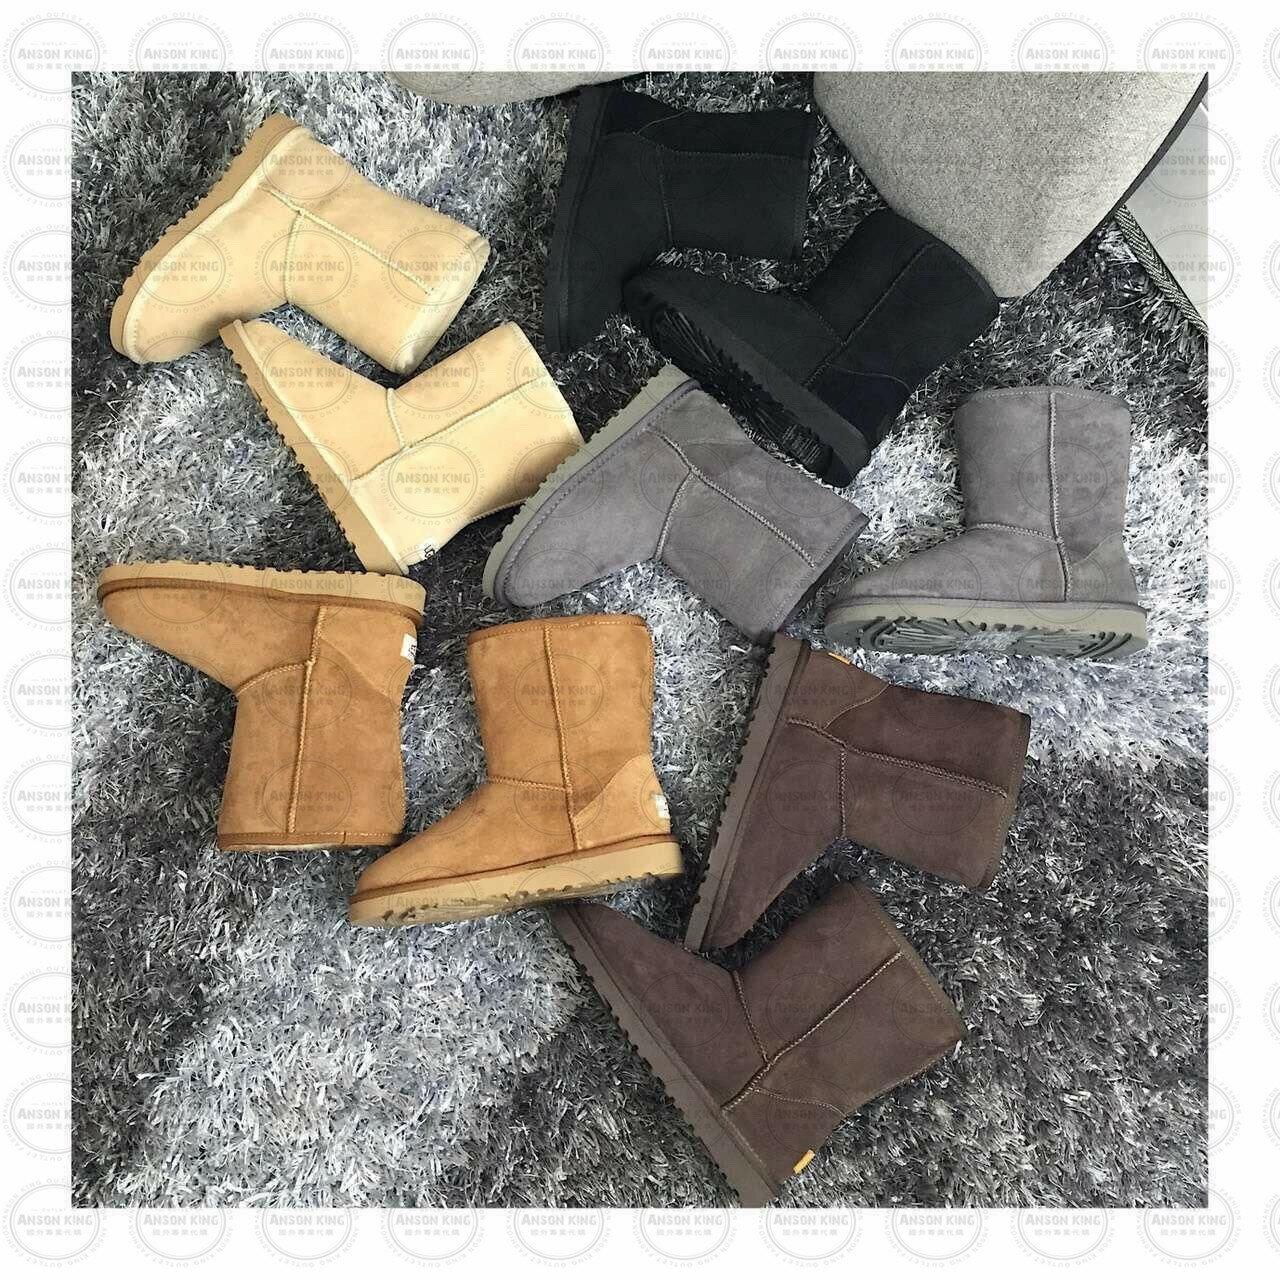 OUTLET正品代購 澳洲 UGG 經典女款羊皮毛一體雪靴 短靴 保暖 真皮羊皮毛 雪靴 短靴 灰色 2